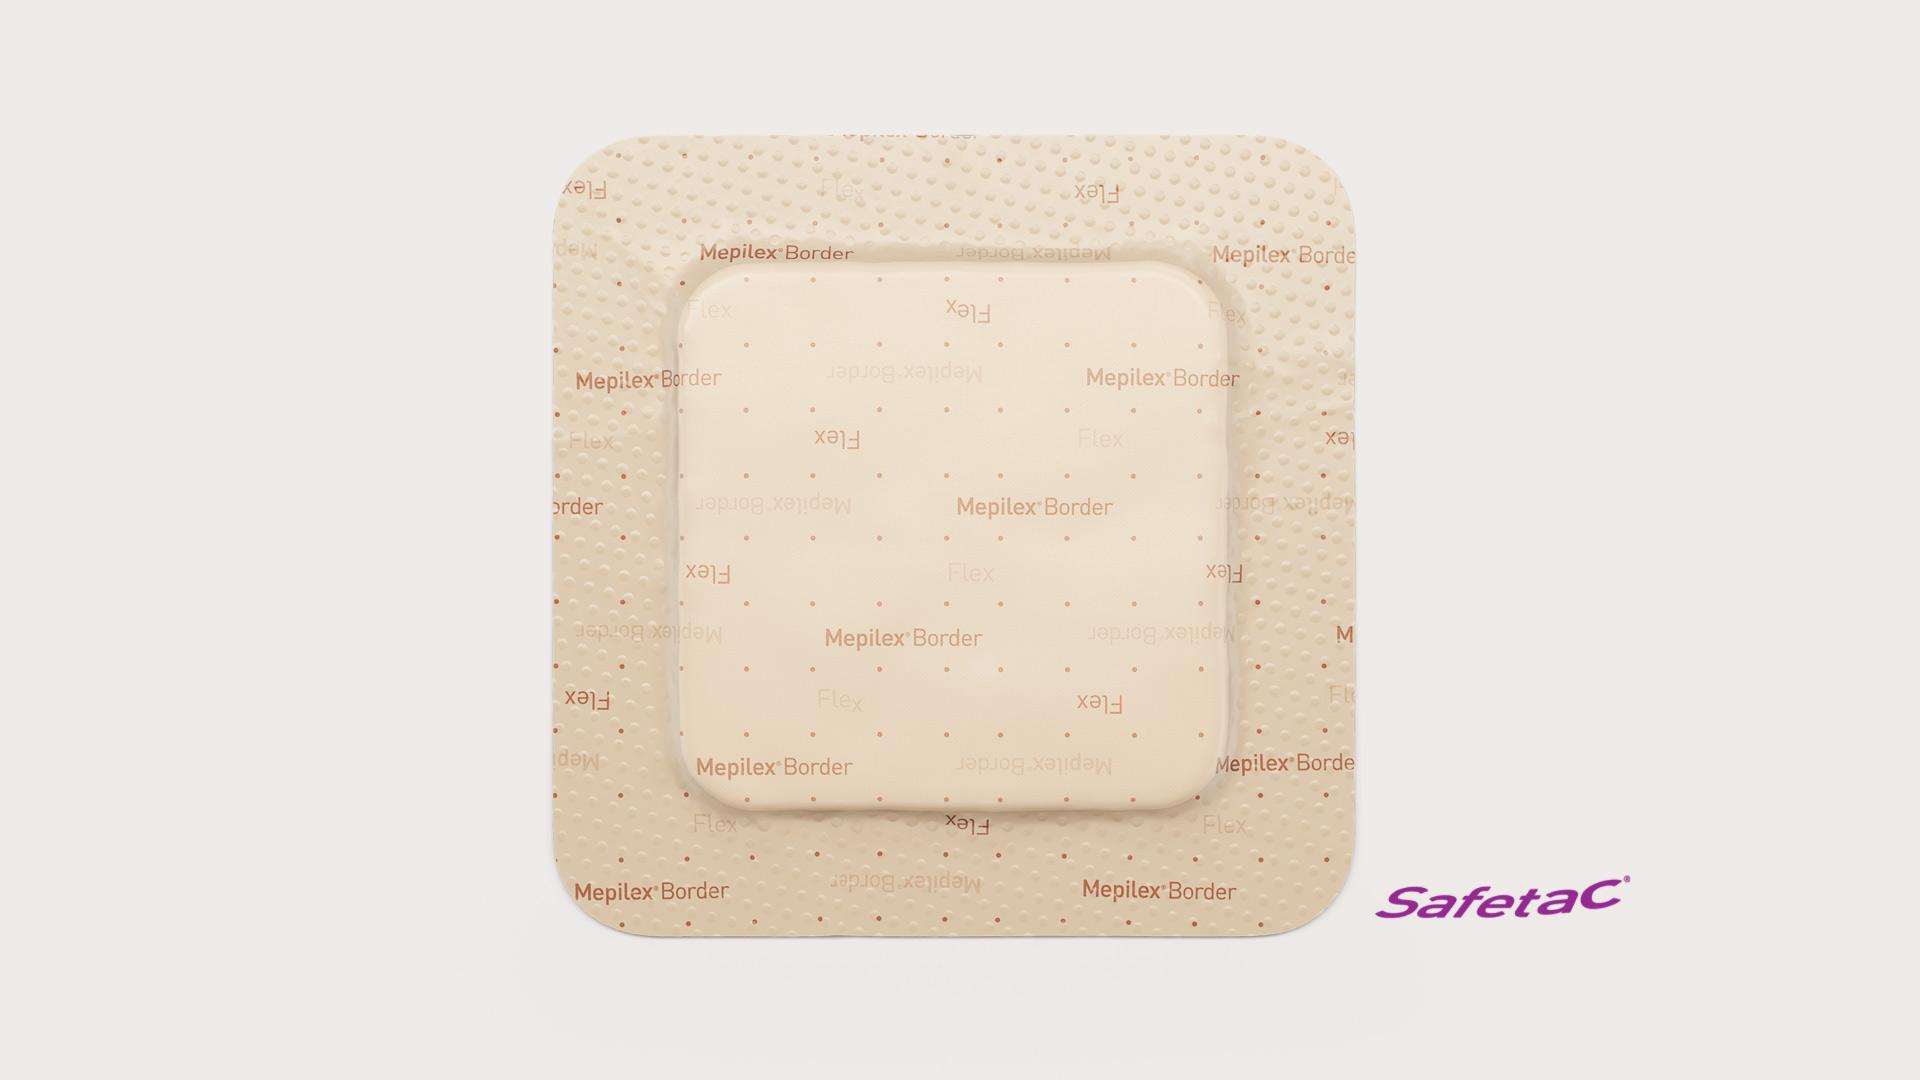 Mepilex Border Flex advanced foam dressing with extra conformability